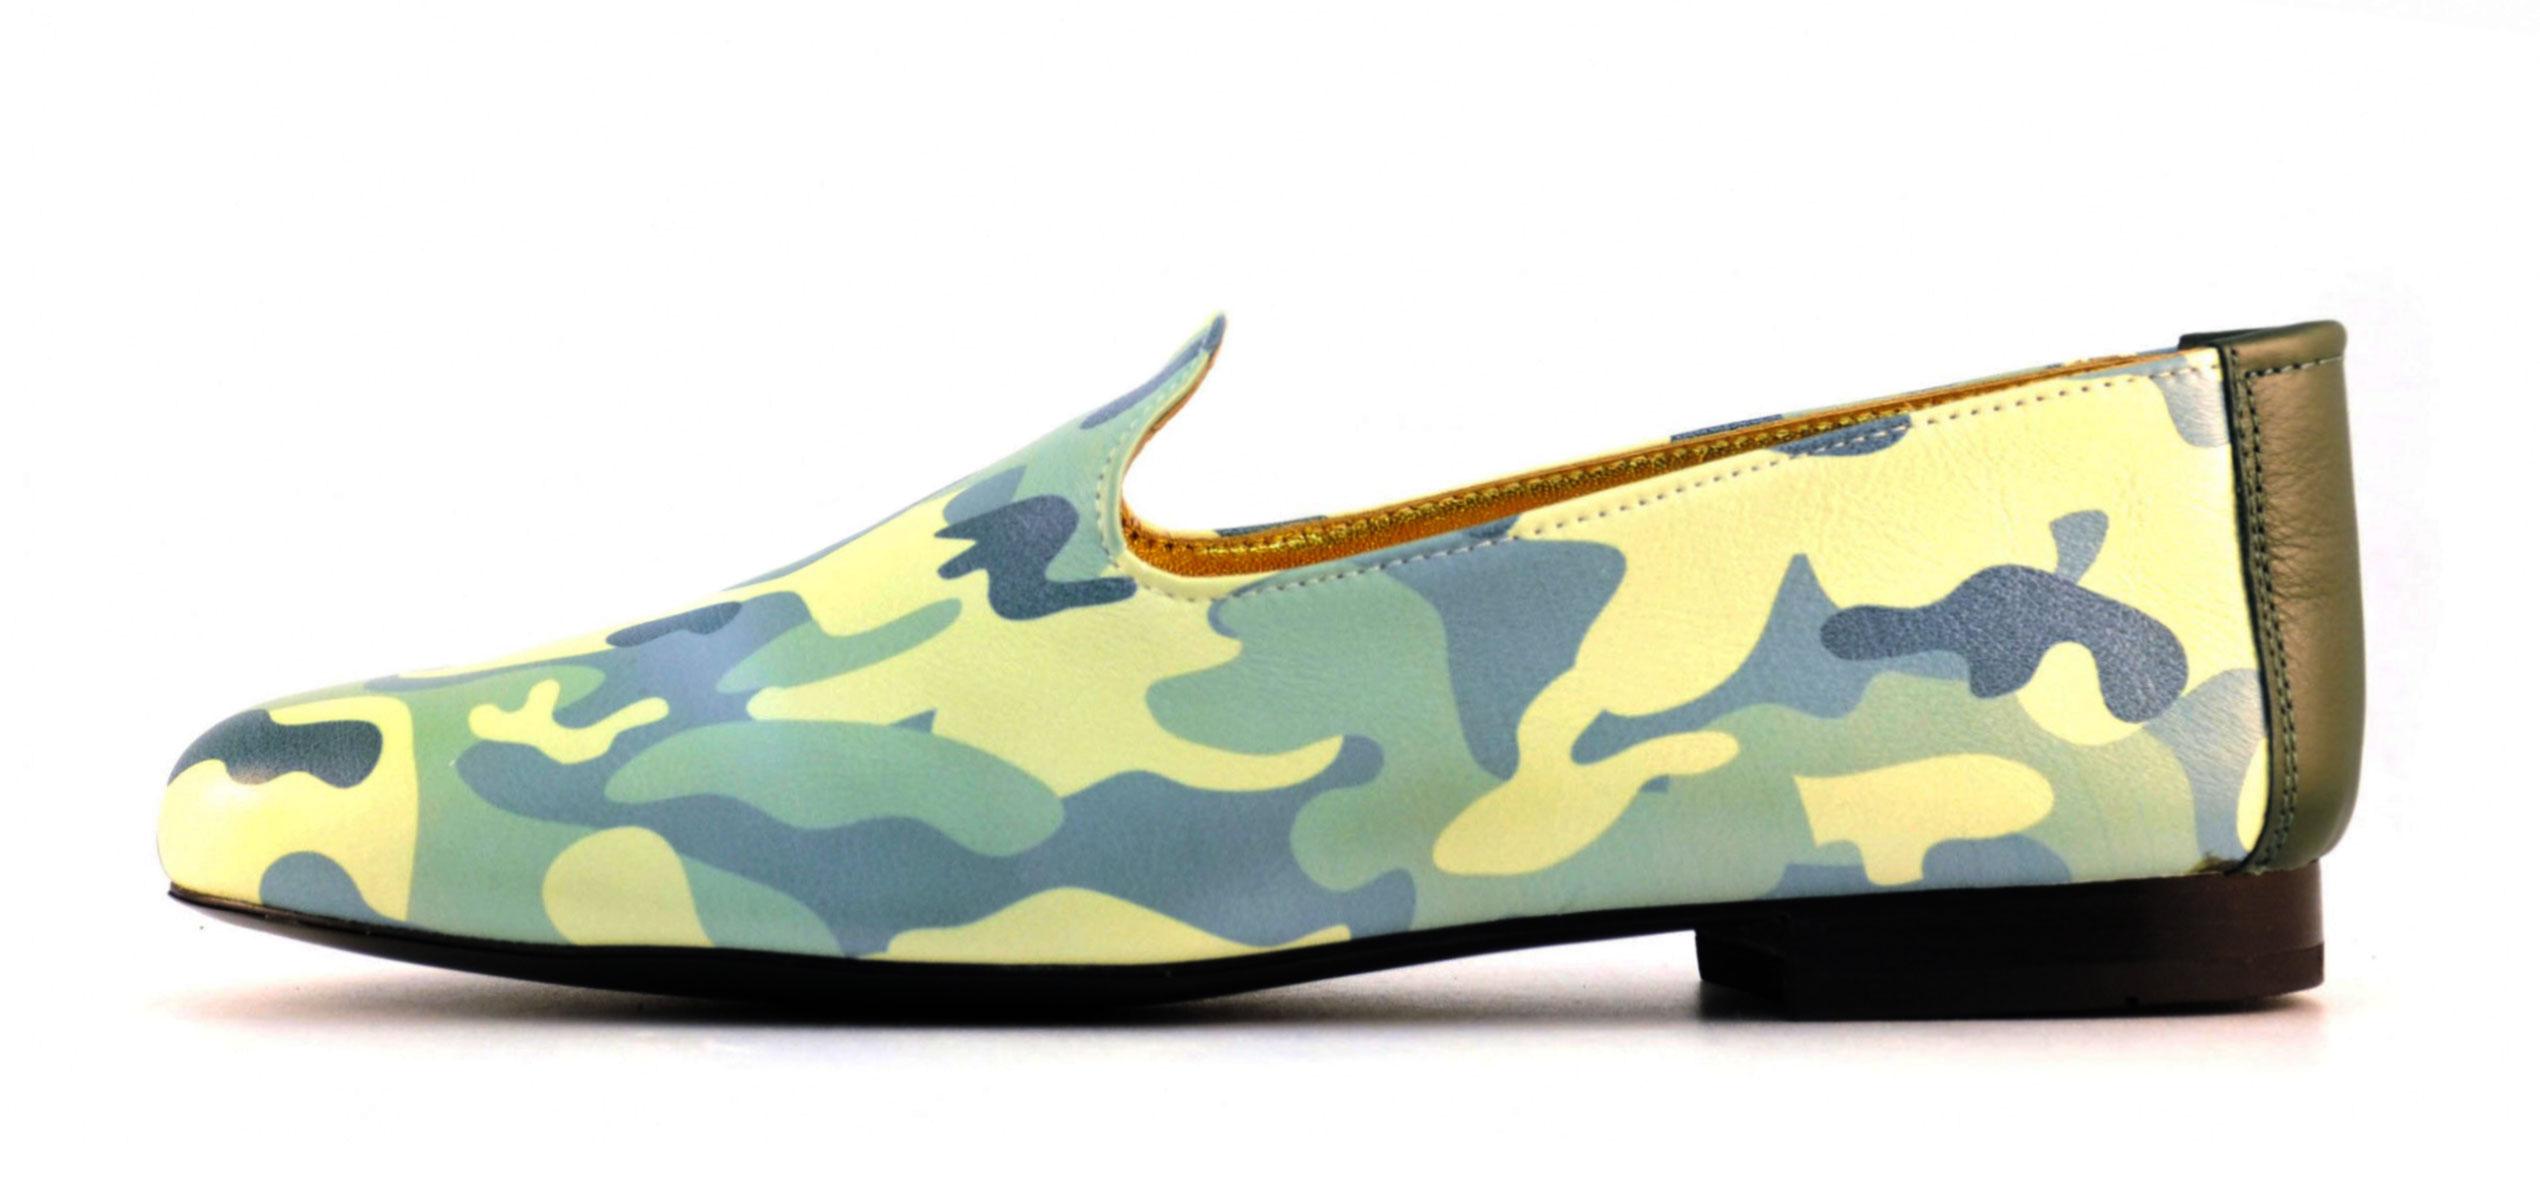 Foto 1 de Zapato Mocasin Mimic Camuflage - Napa Blanca Impresa